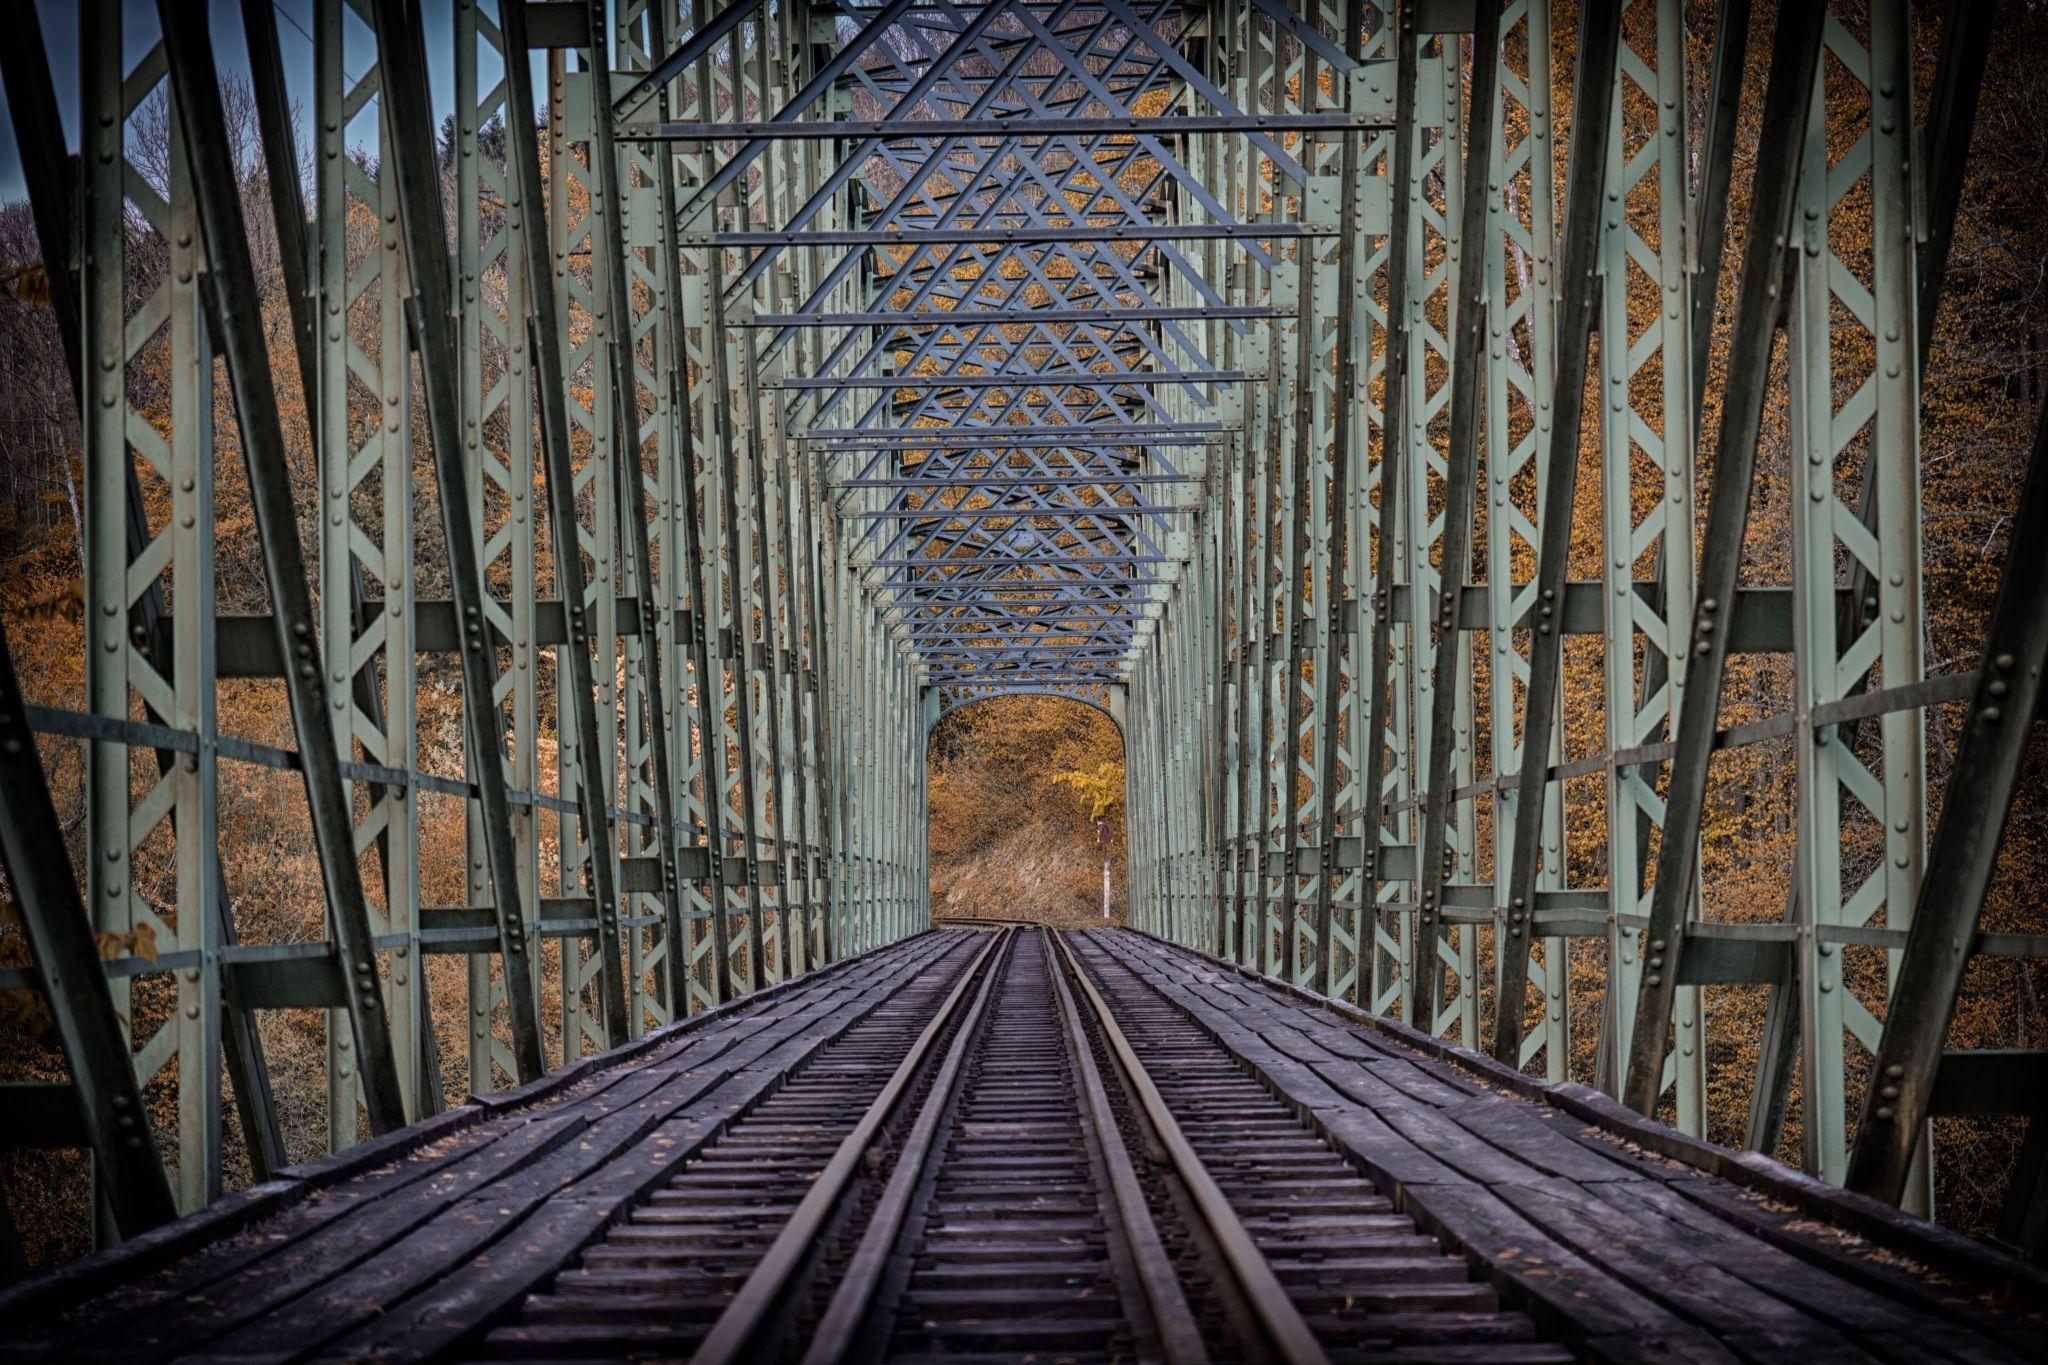 Steyrtalbahnbrücke, Austria